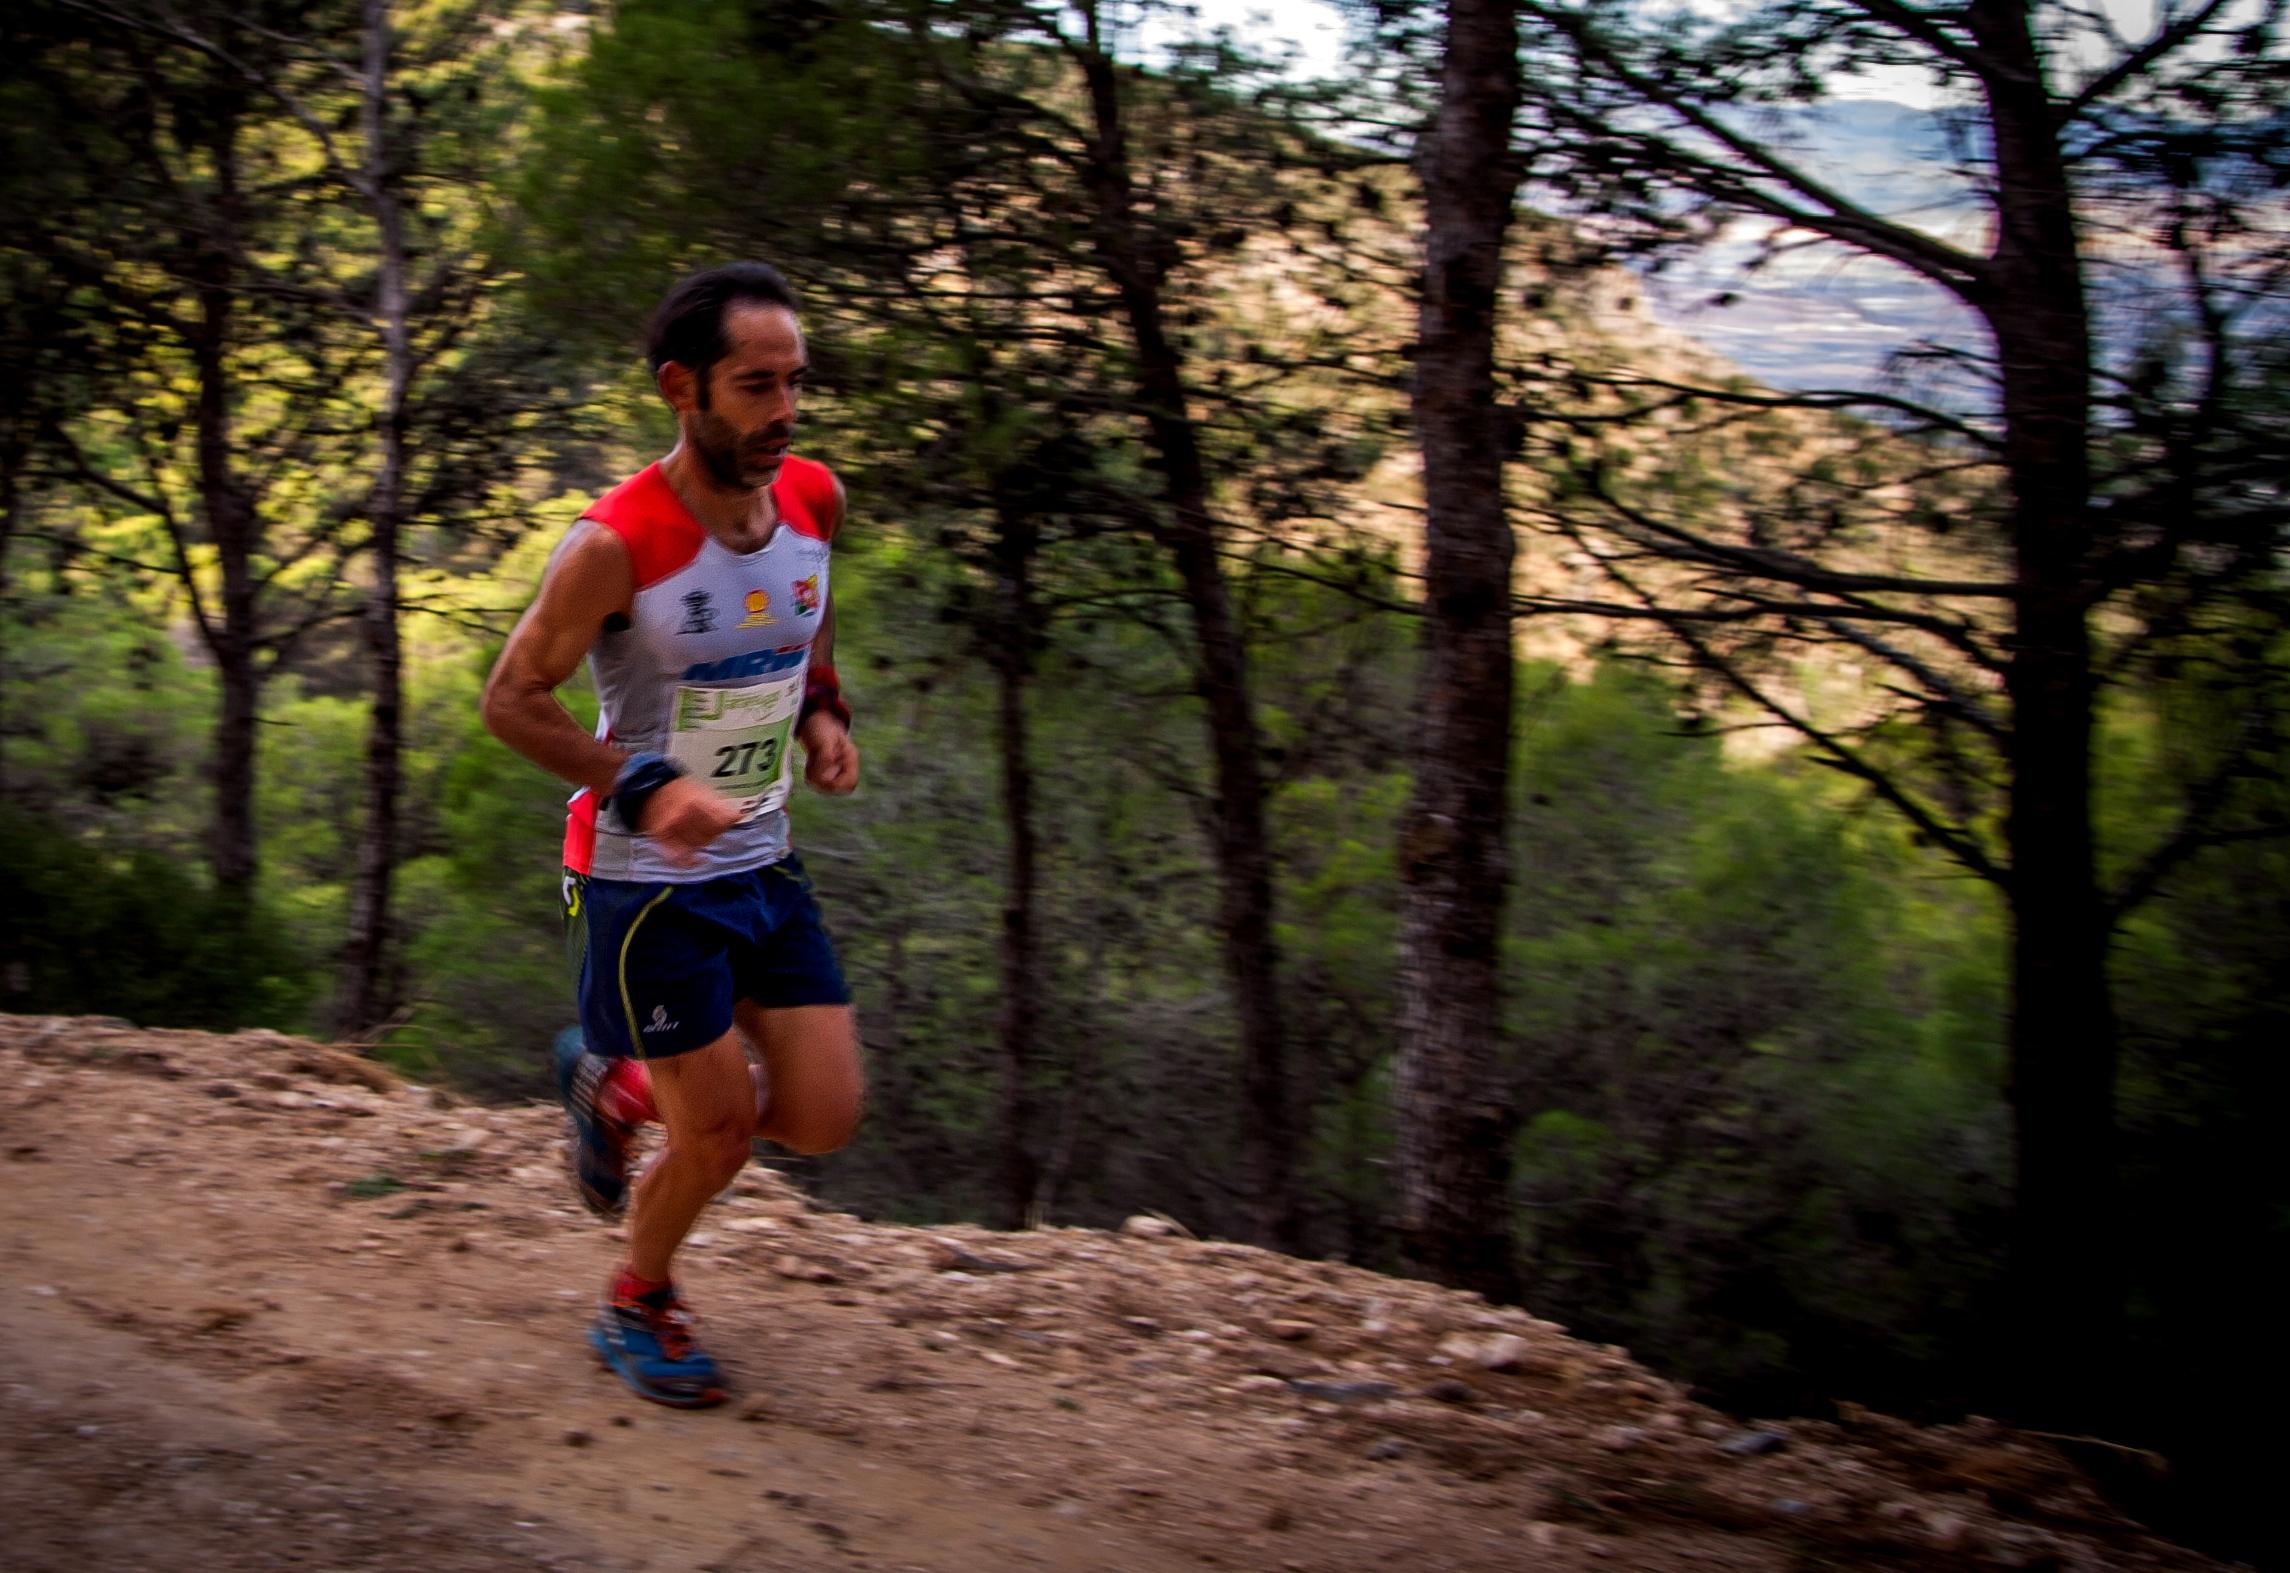 Resultado de imagen para maraton de montaña